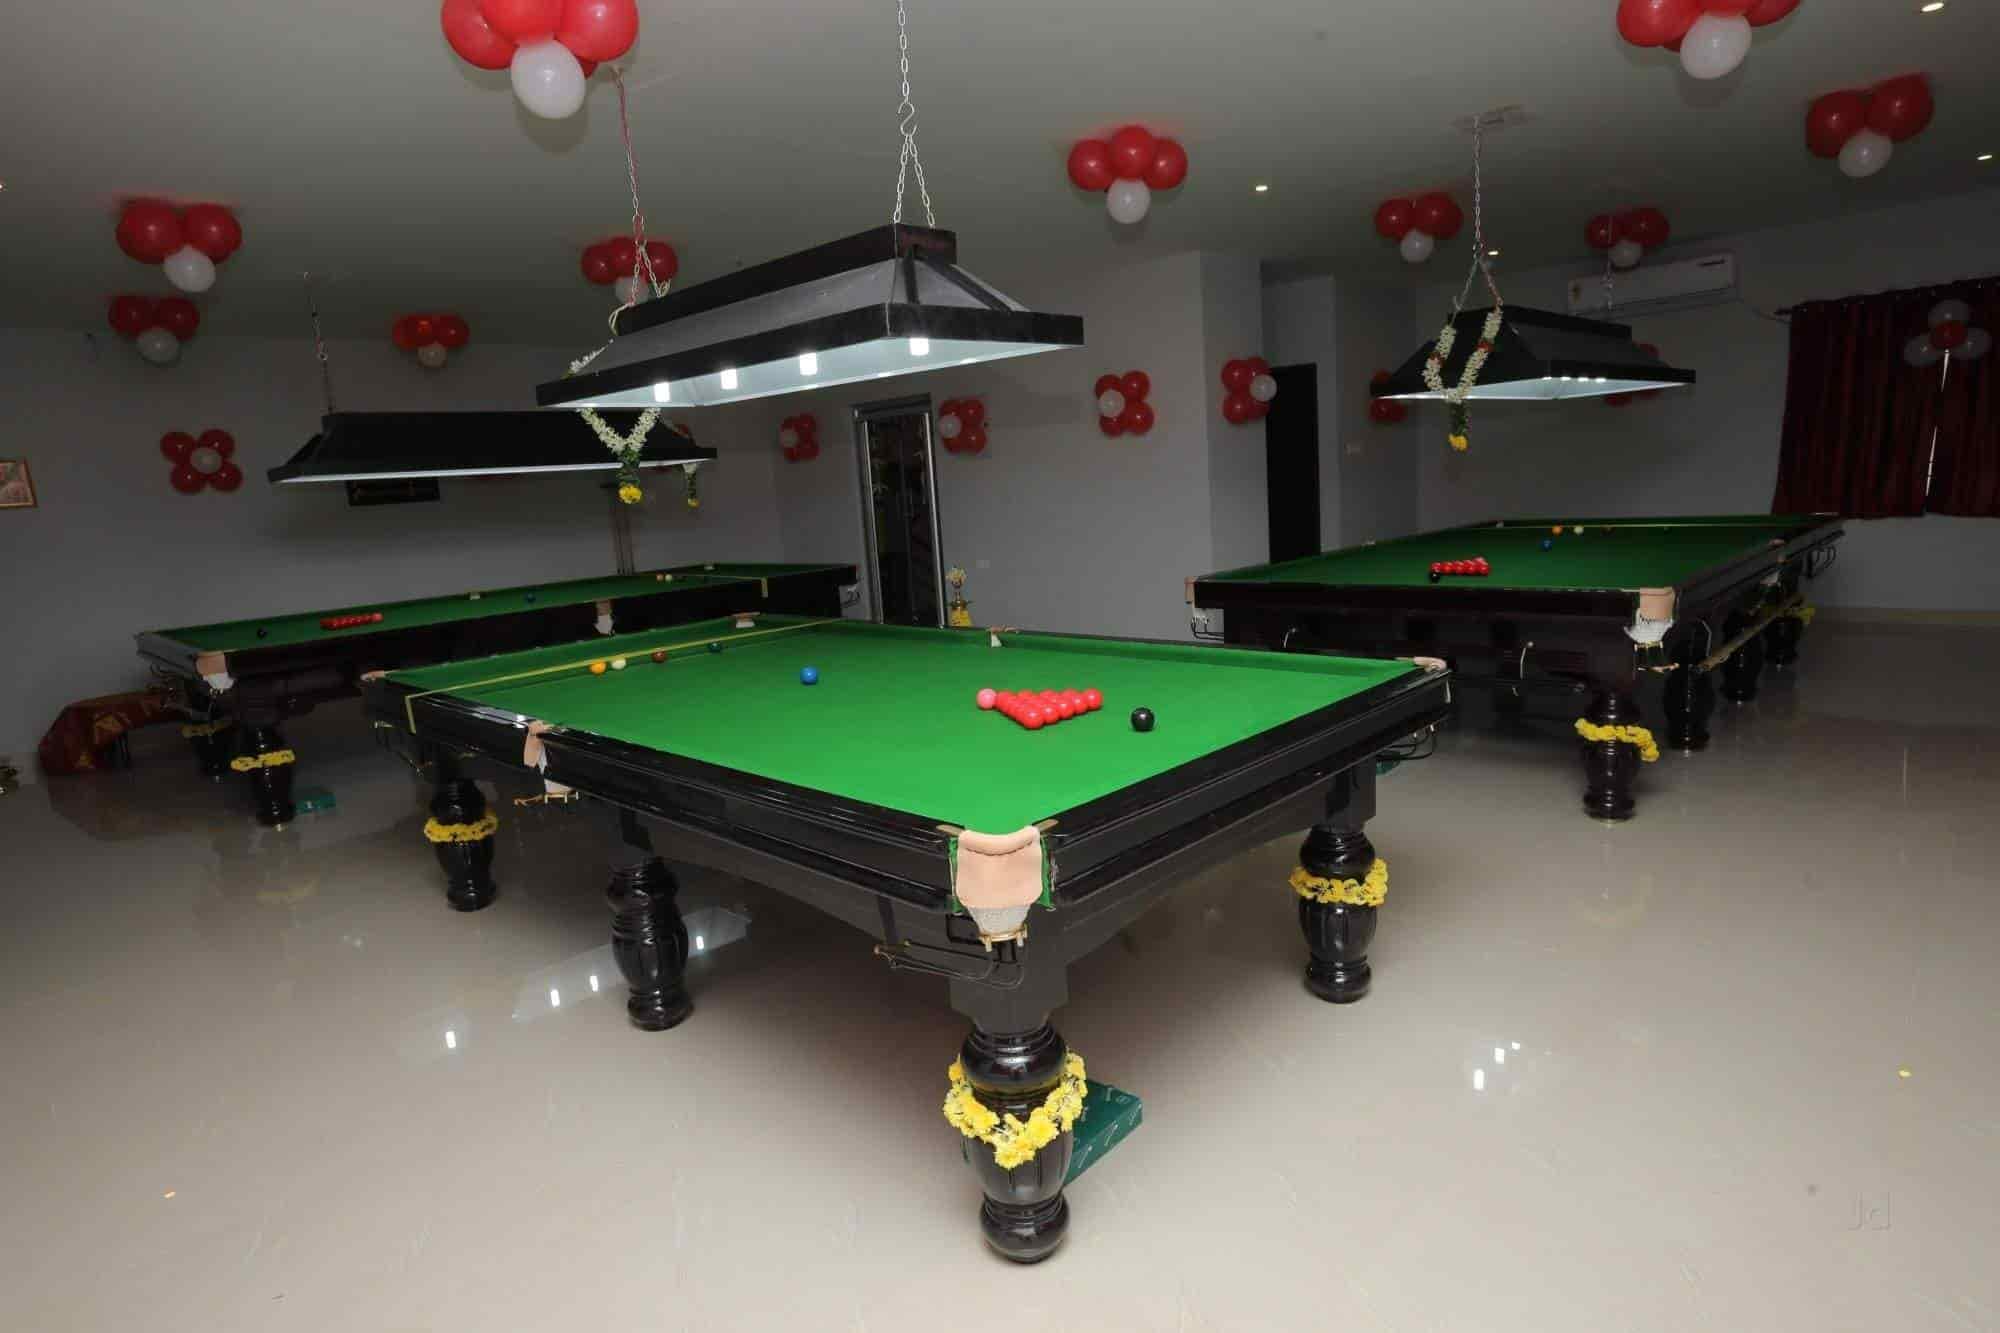 MR Billiards Photos Kolathur Chennai Pictures Images Gallery - Mr billiards pool table